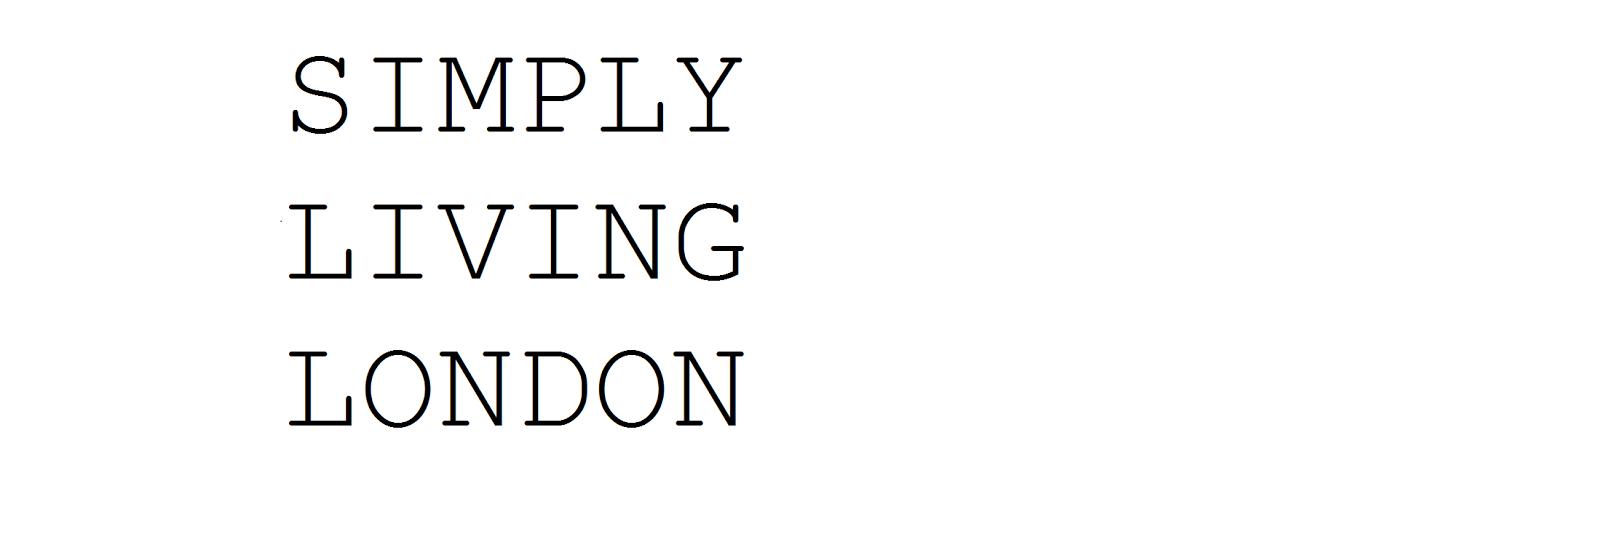 SIMPLY LIVING LONDON